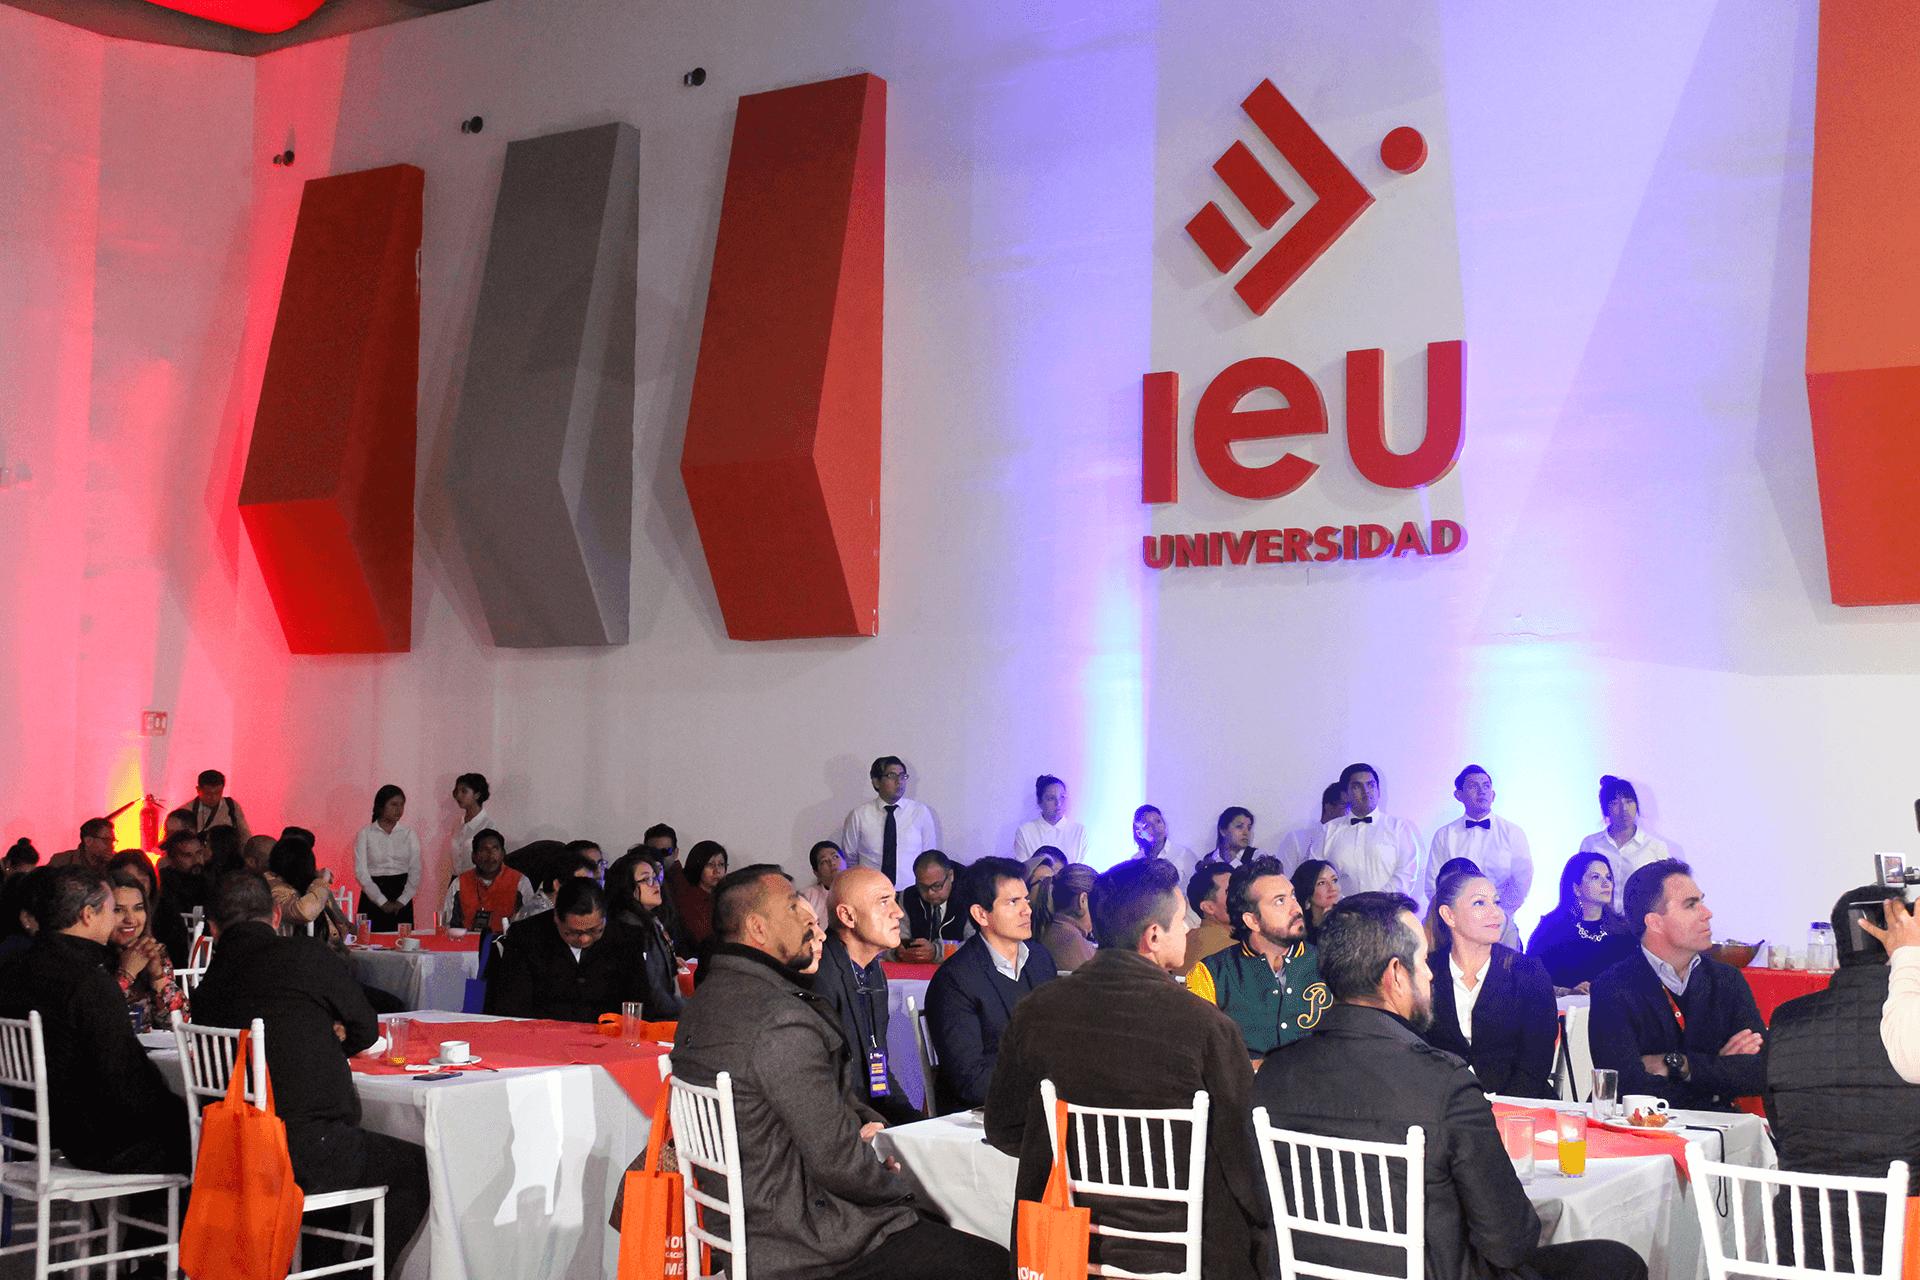 Universidad Ieu Alianza Exclusiva Con Barça Innovation Hub 02